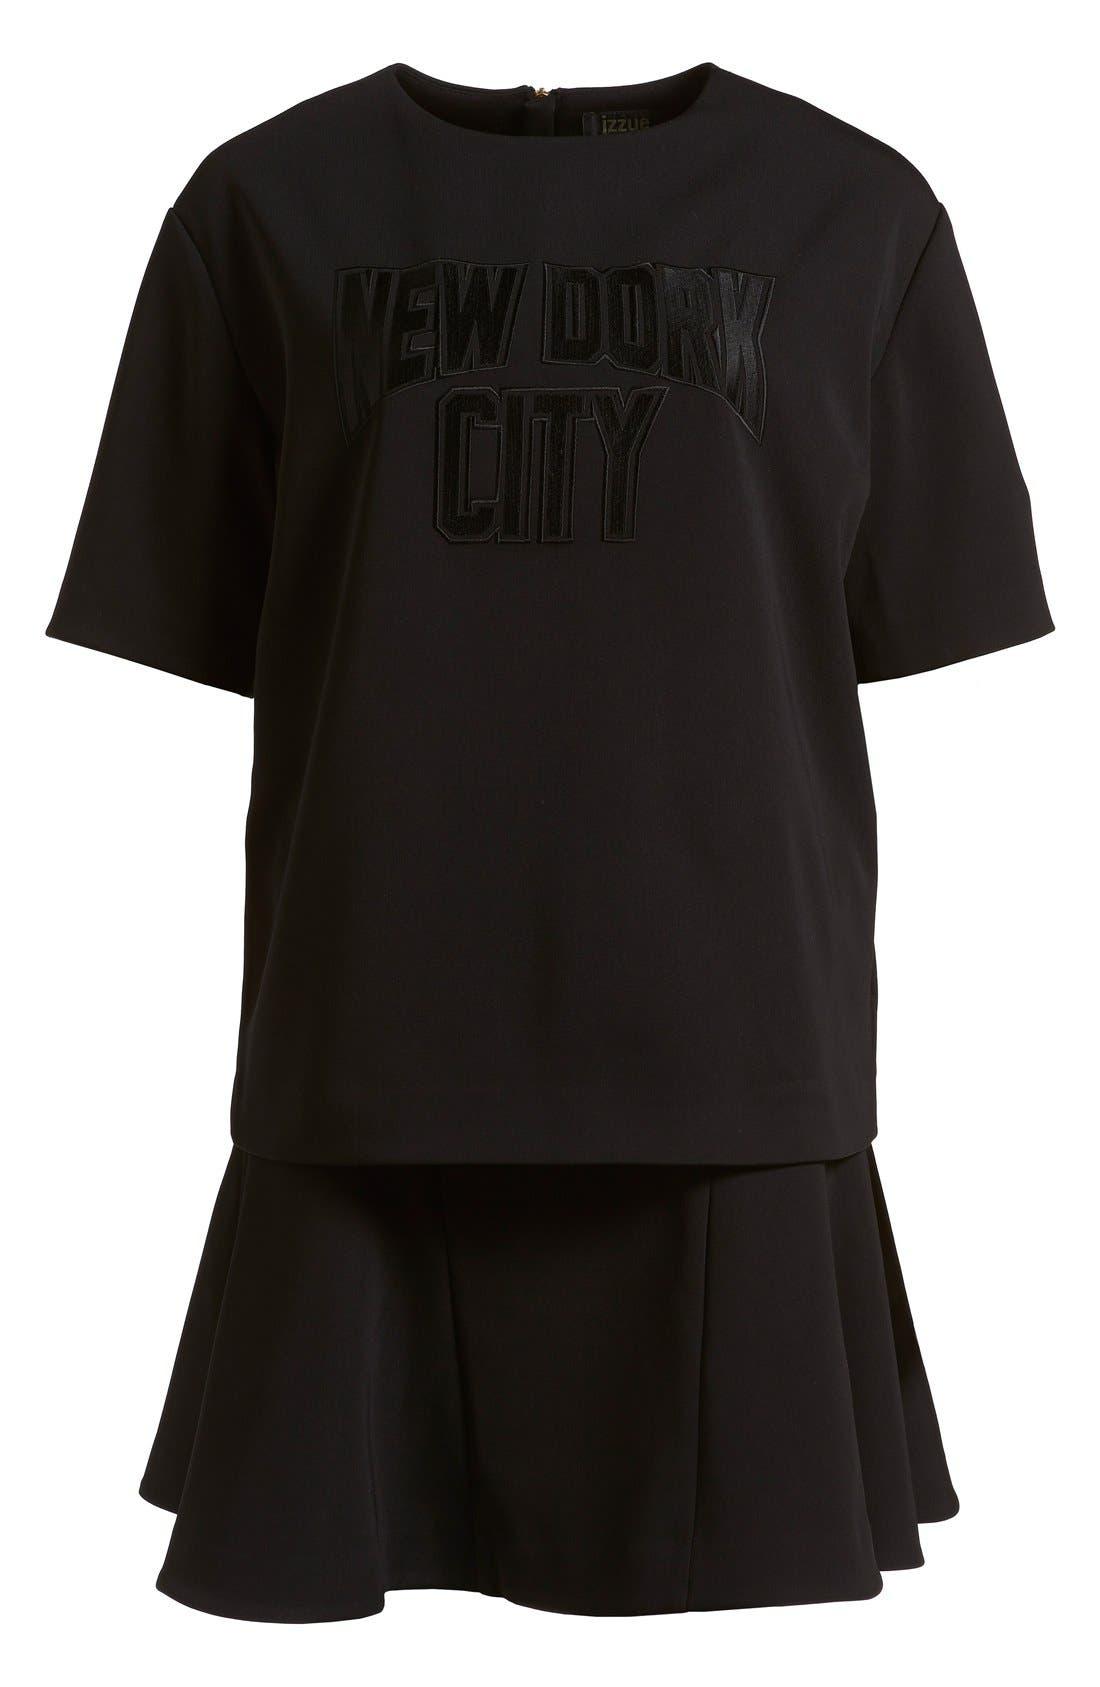 Alternate Image 1 Selected - izzue Bonded T-Shirt Dress (Women)